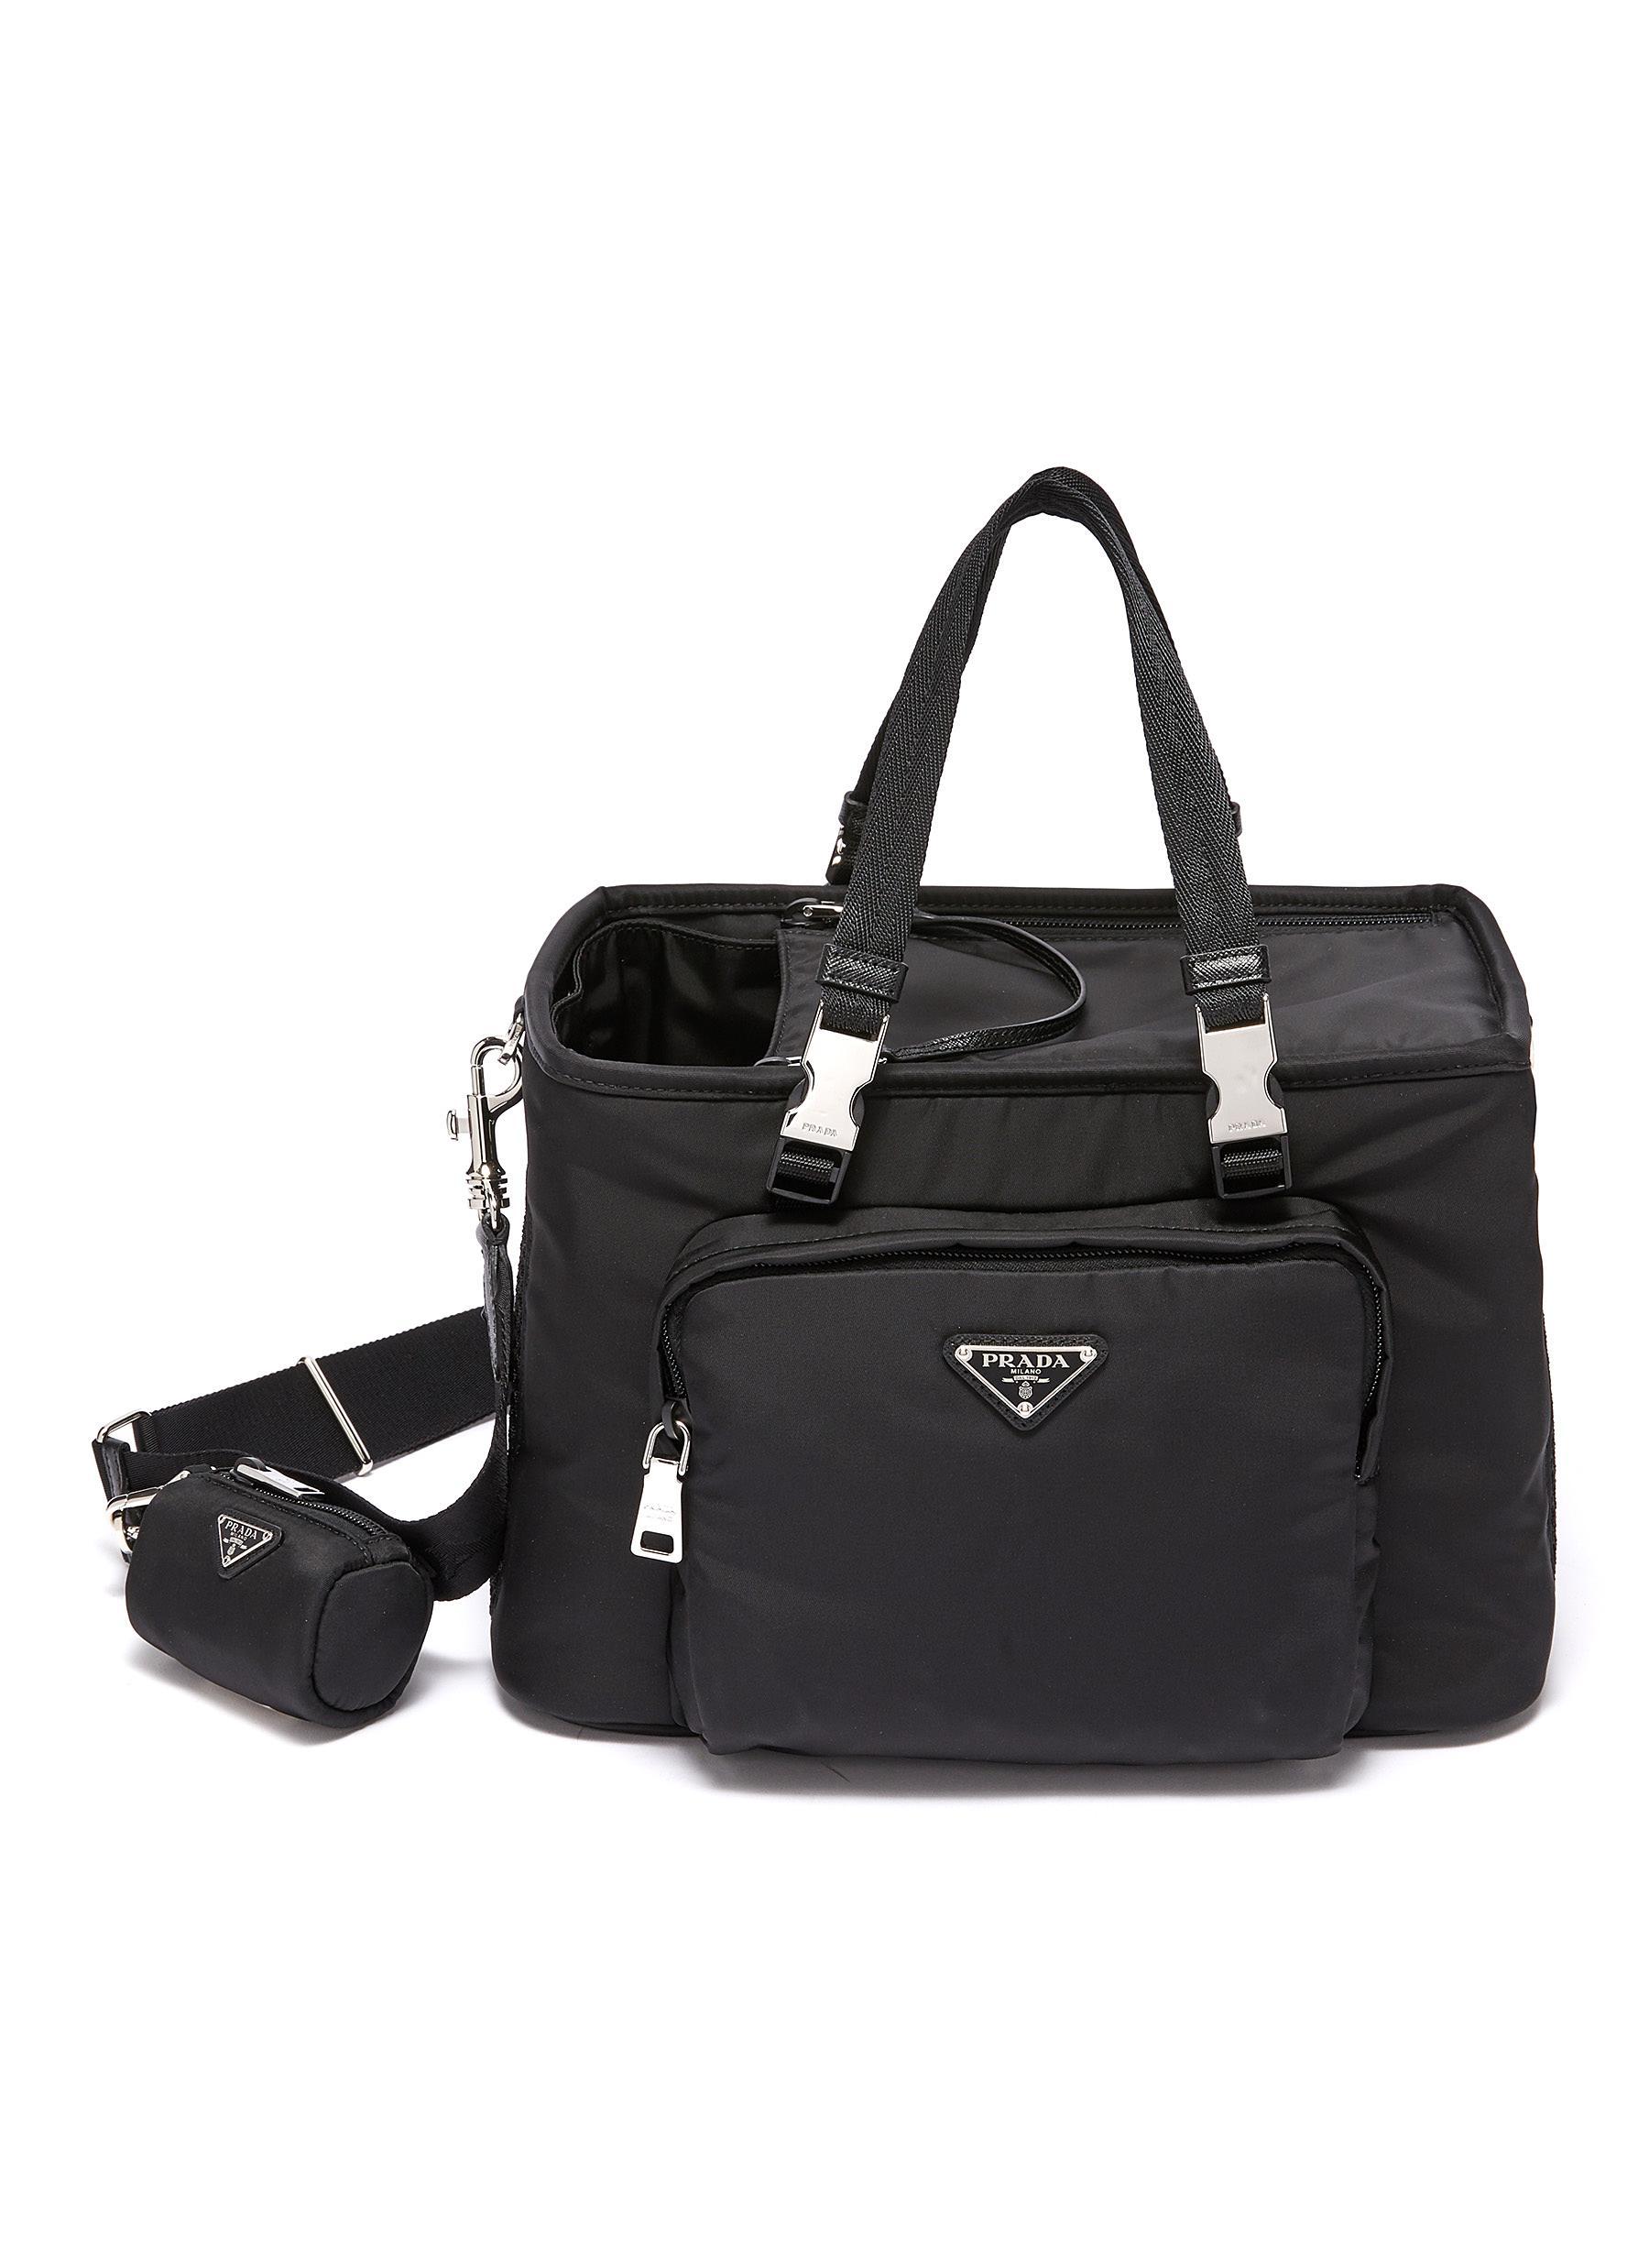 PRADA Re-Nylon Saffiano leather pet tote bag